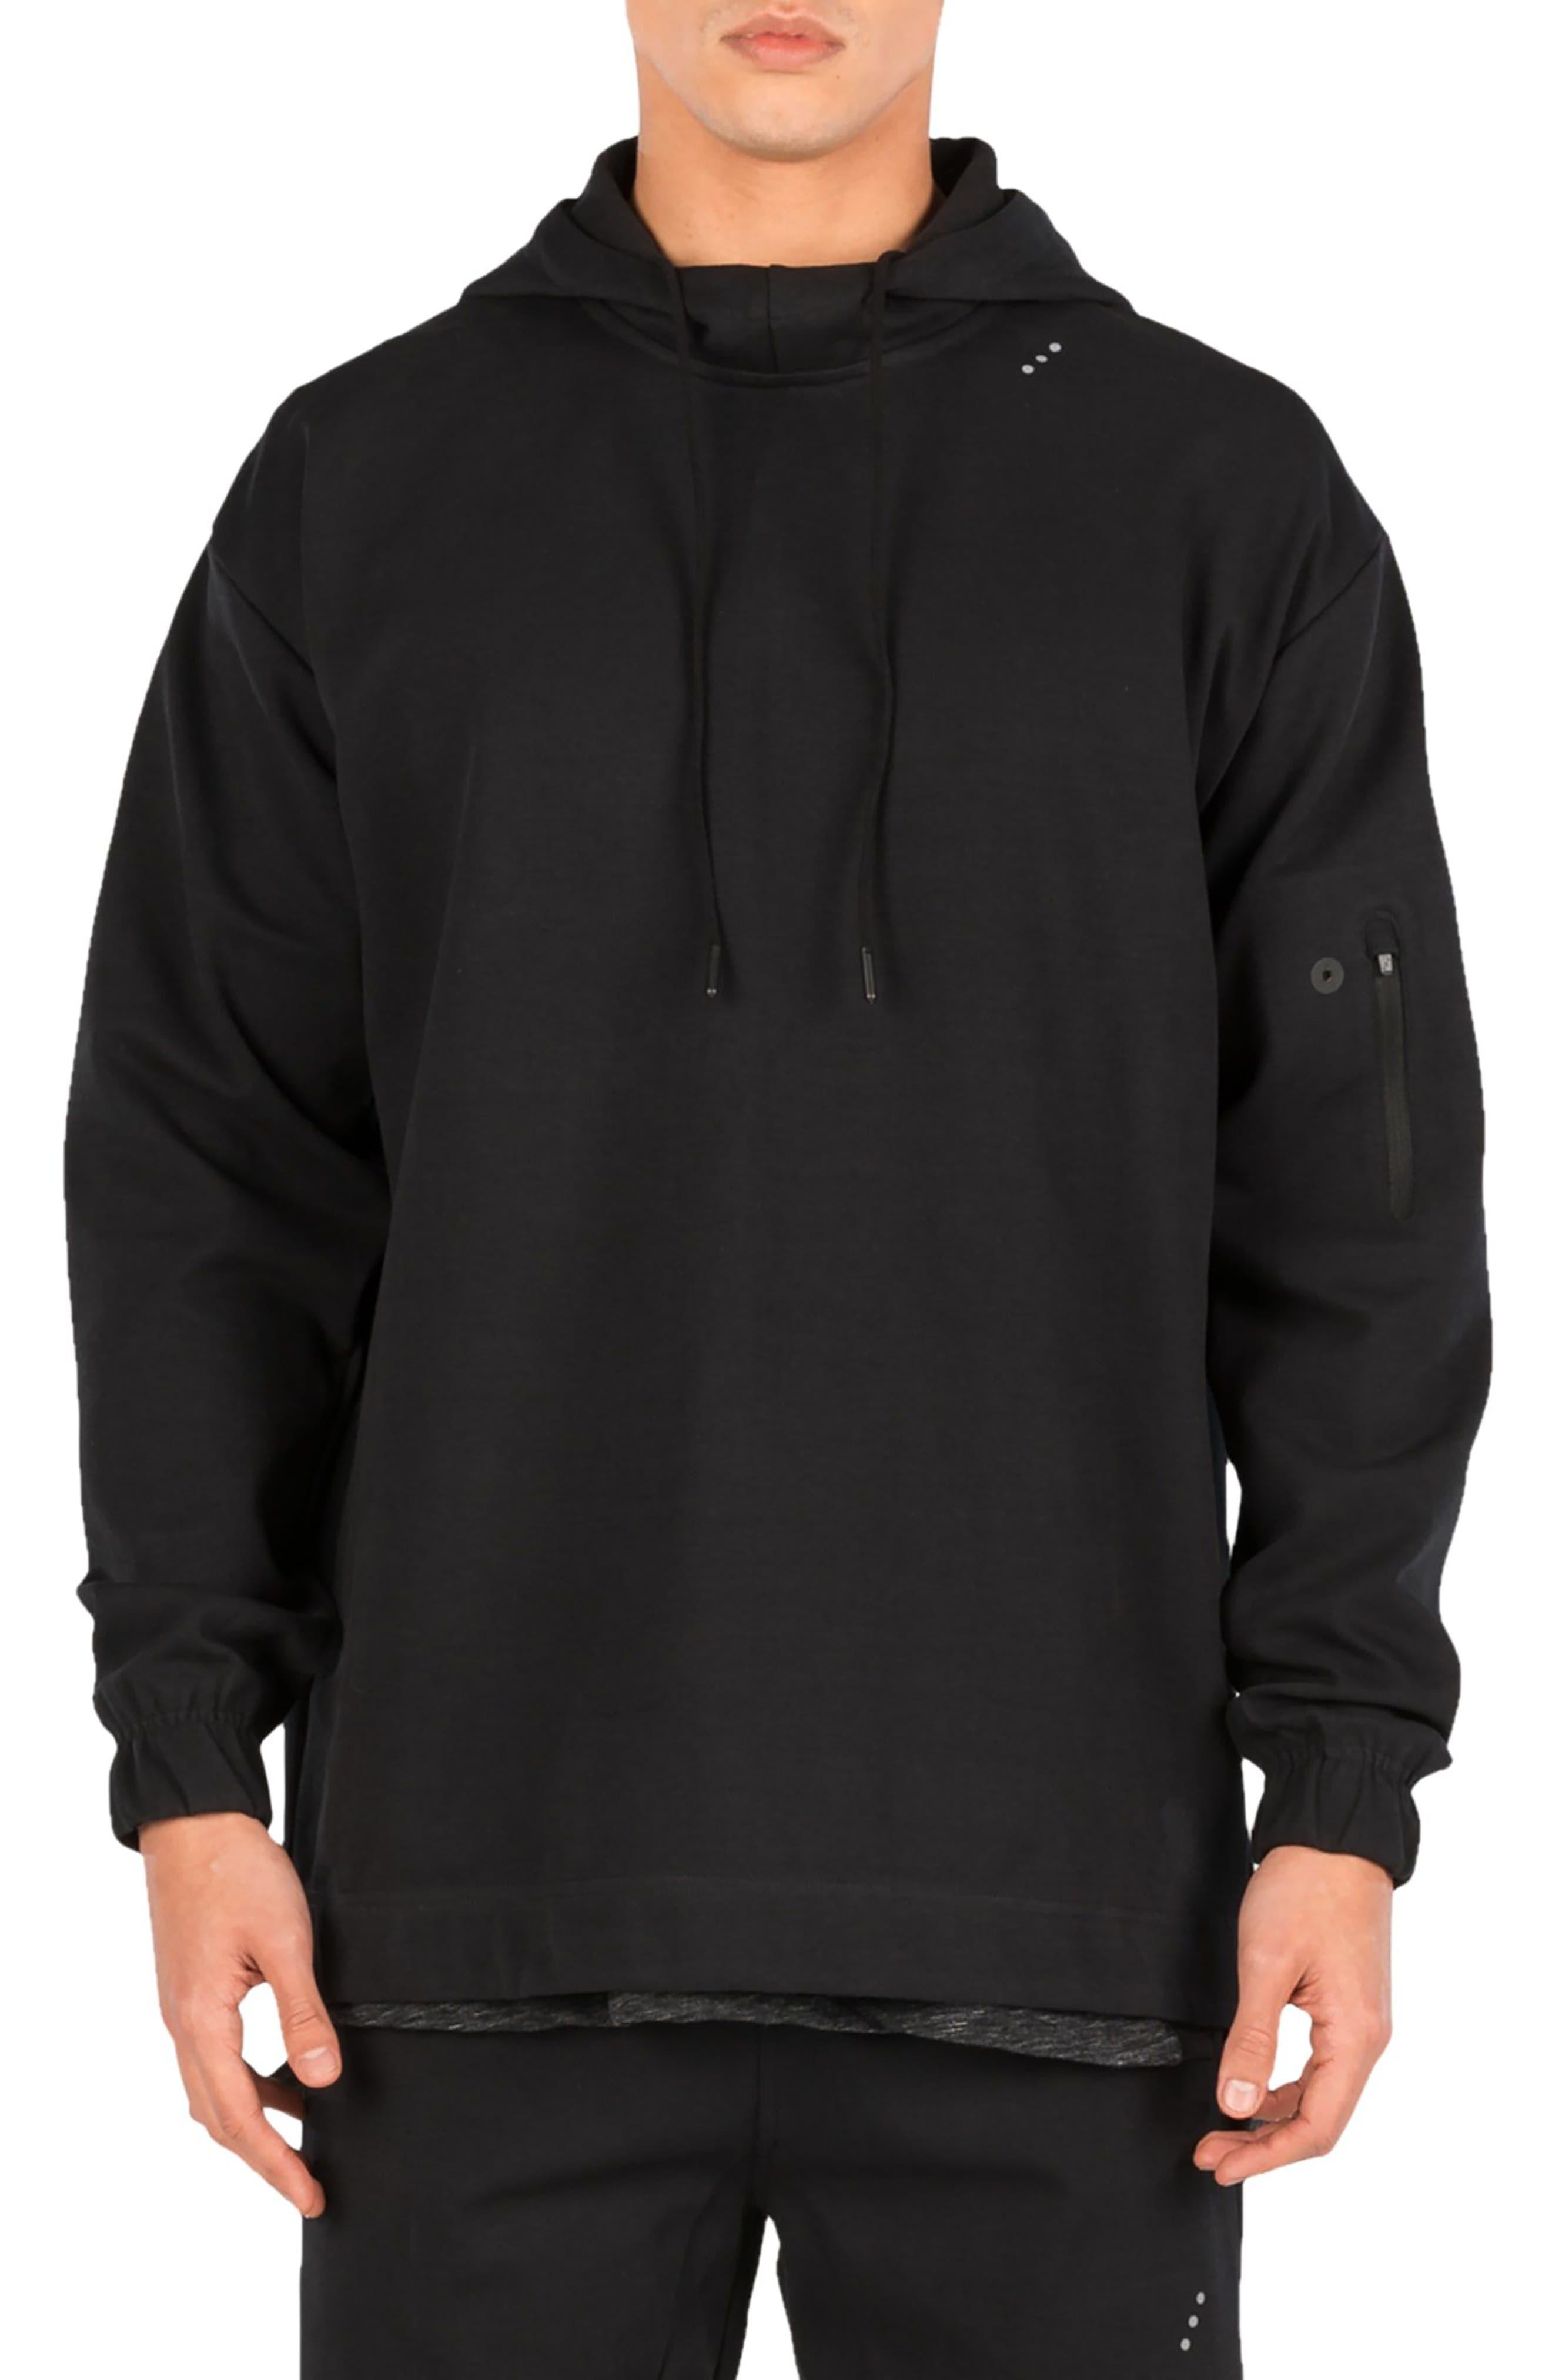 Alternate Image 1 Selected - ZANEROBE REC Tech Hoodie Sweatshirt